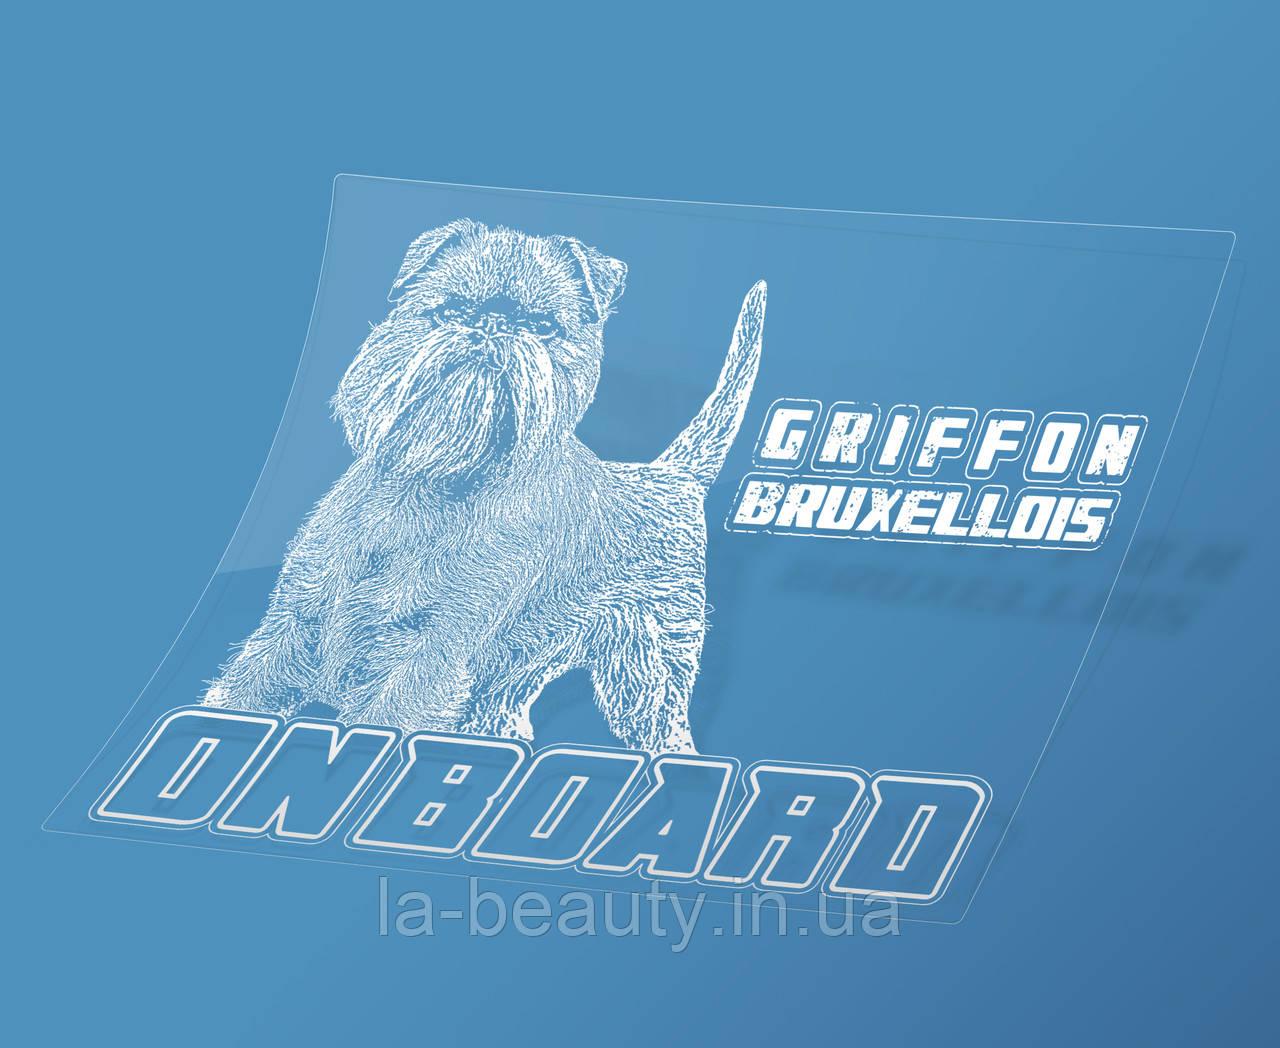 Наклейка на машину Брюссельский гриффон на борту (Griffon Bruxellois On Board)